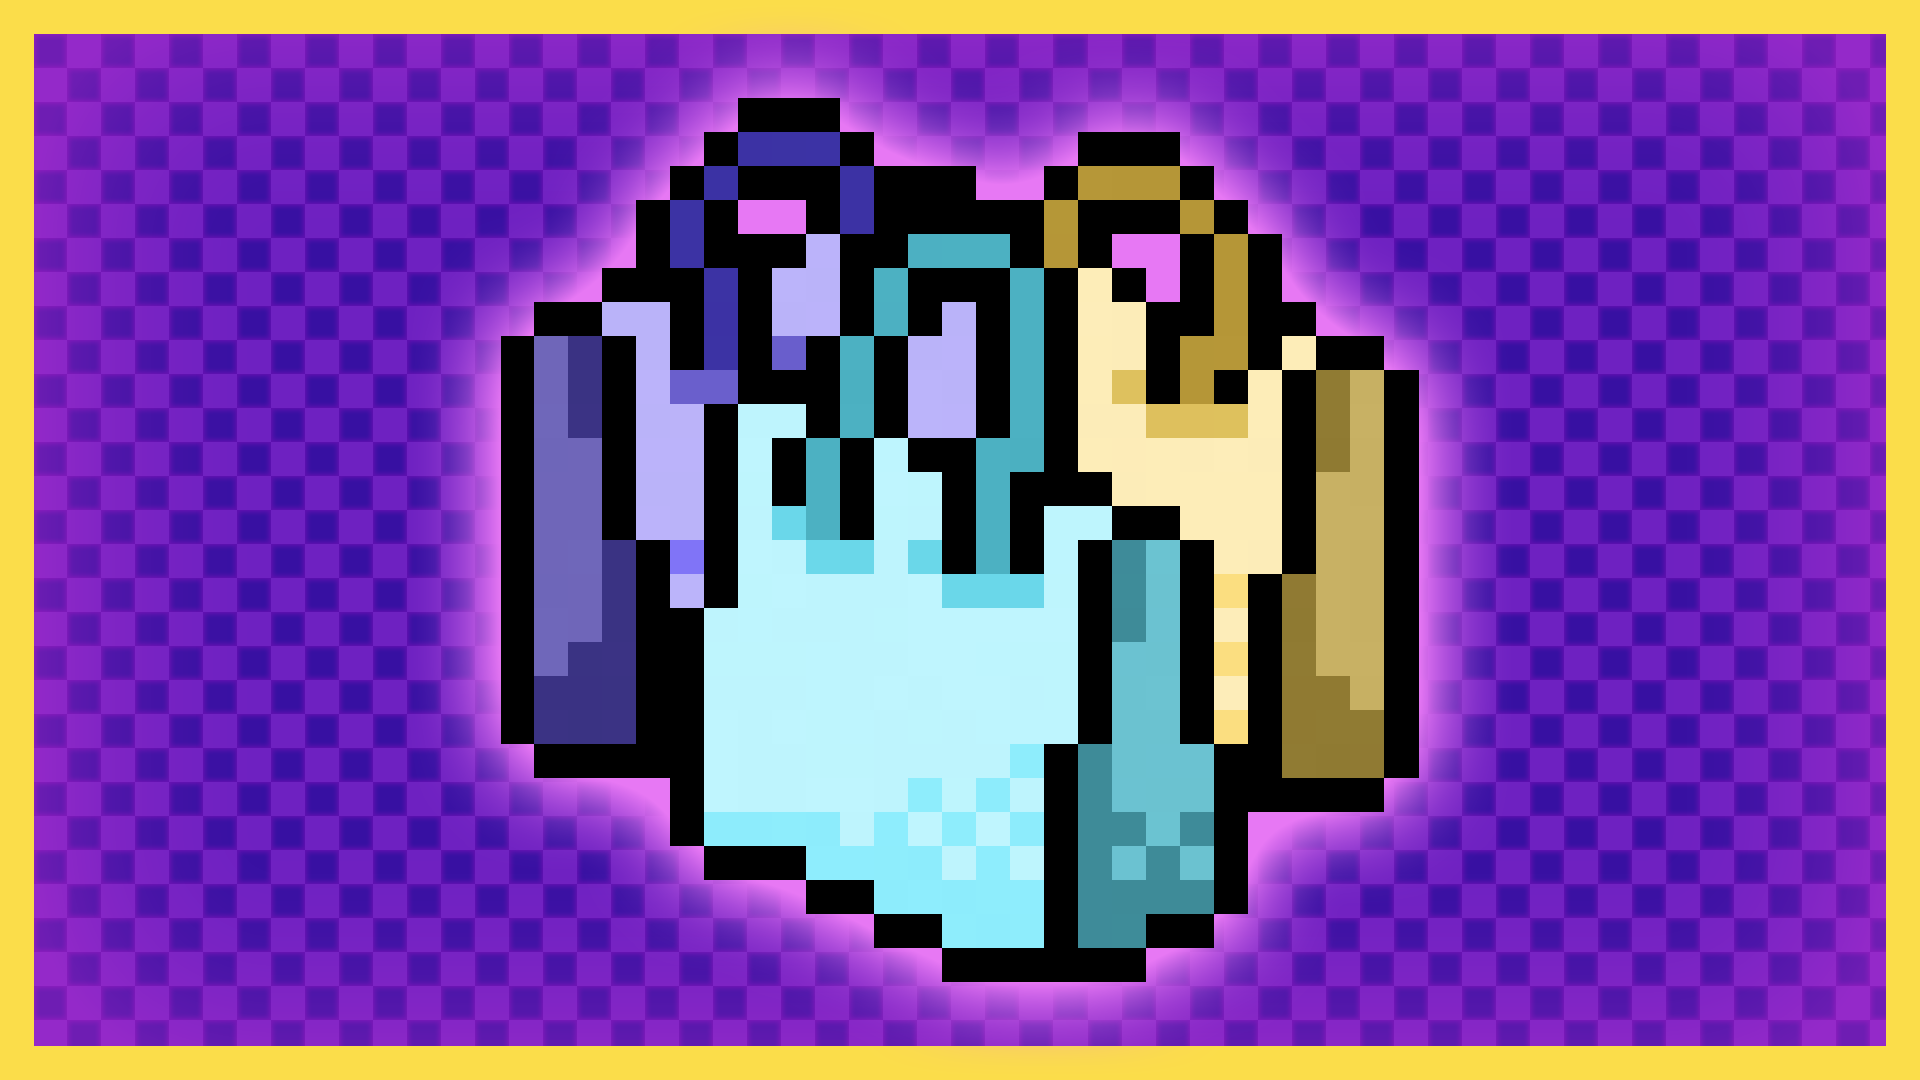 Icon for Shopping Maniac